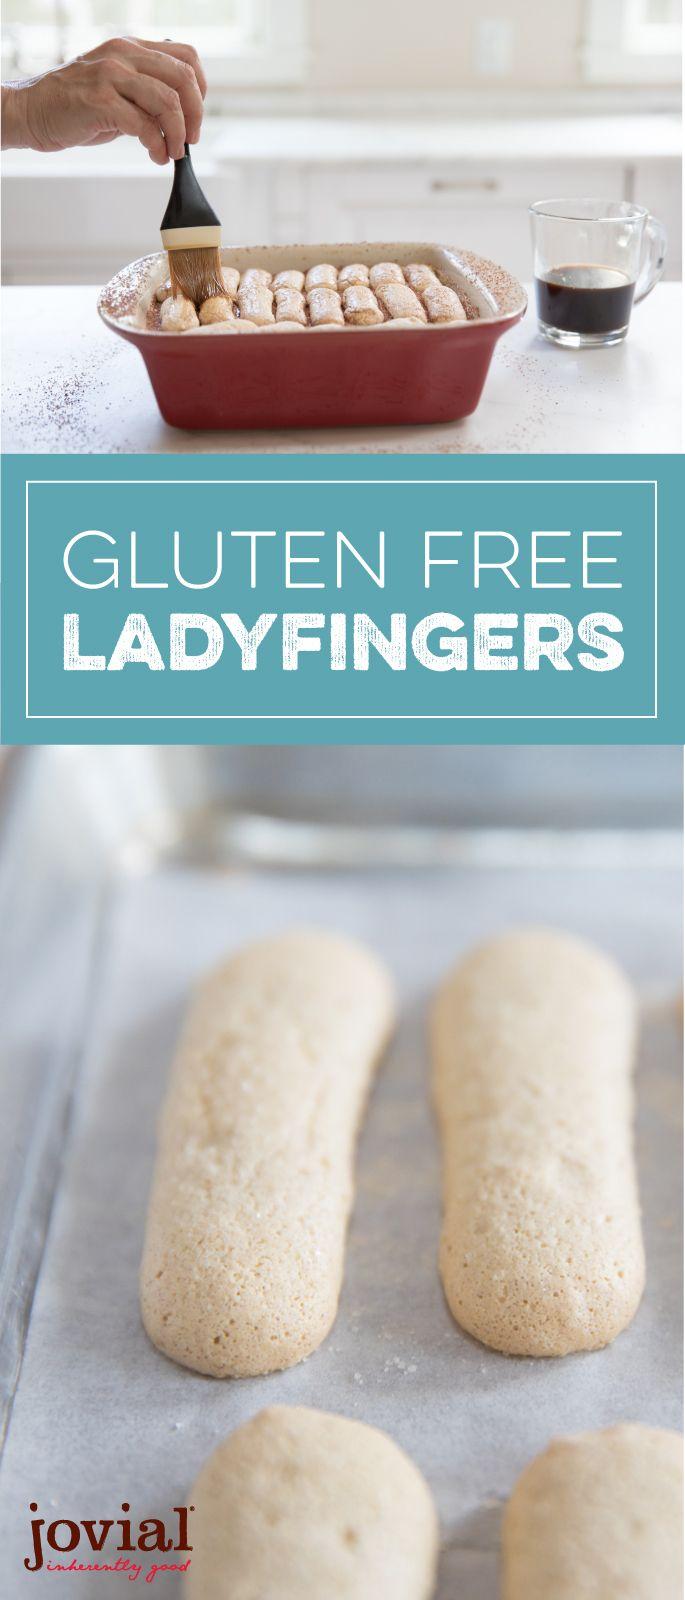 Gluten Free Ladyfingers   jovialfoods.com